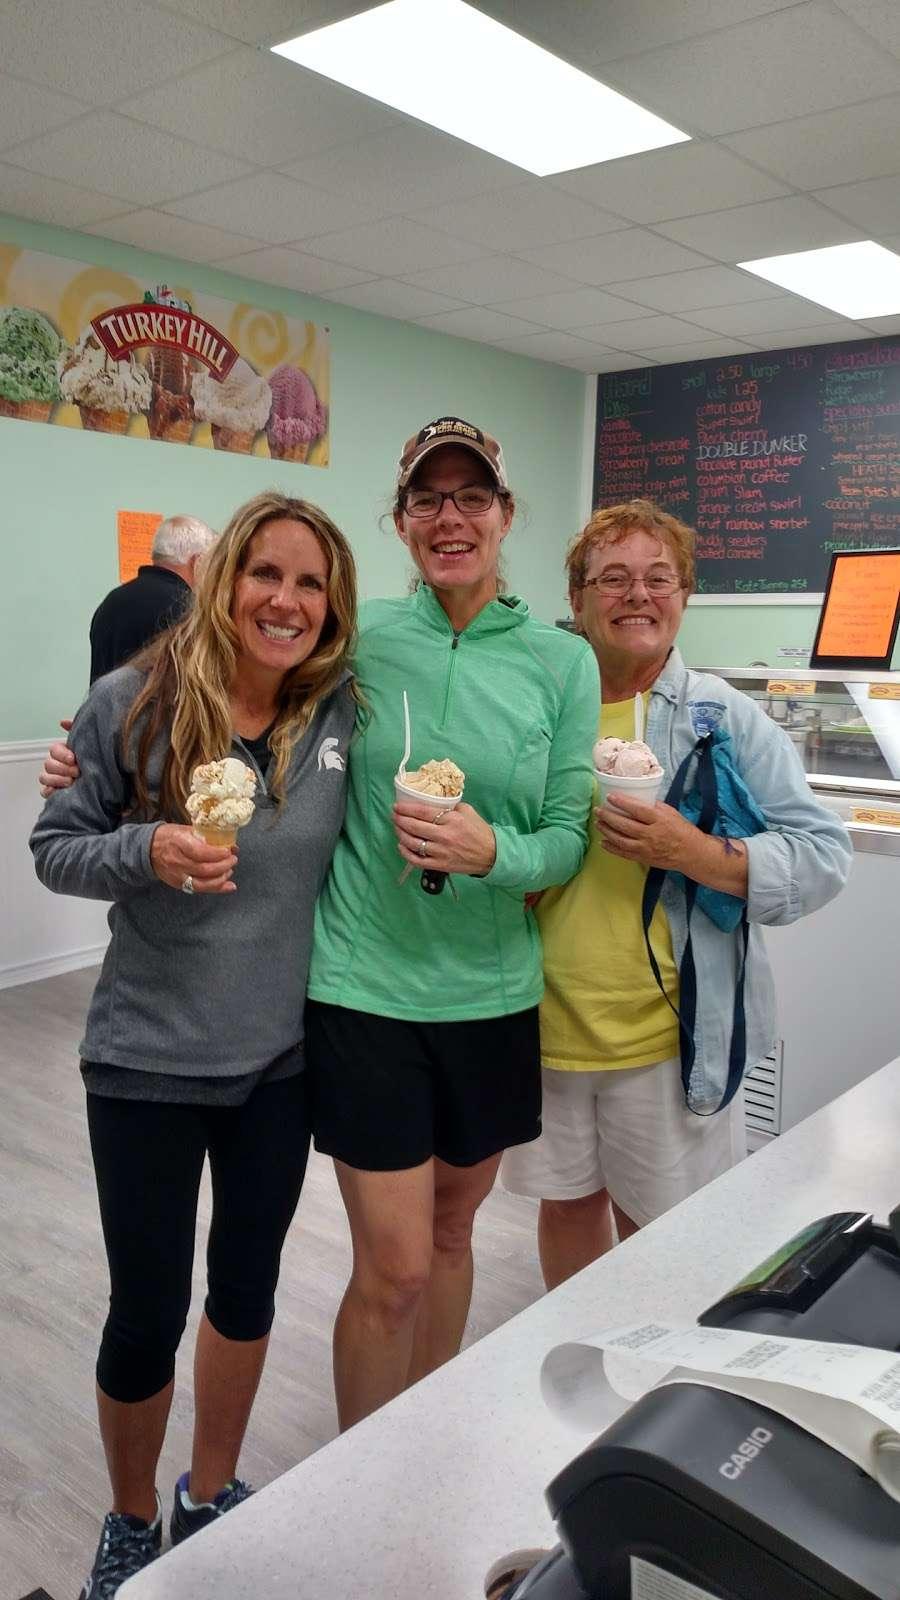 Maxs Ice Cream Shack - store  | Photo 9 of 10 | Address: 202 W 3rd St, Mifflinville, PA 18631, USA | Phone: (570) 520-4237